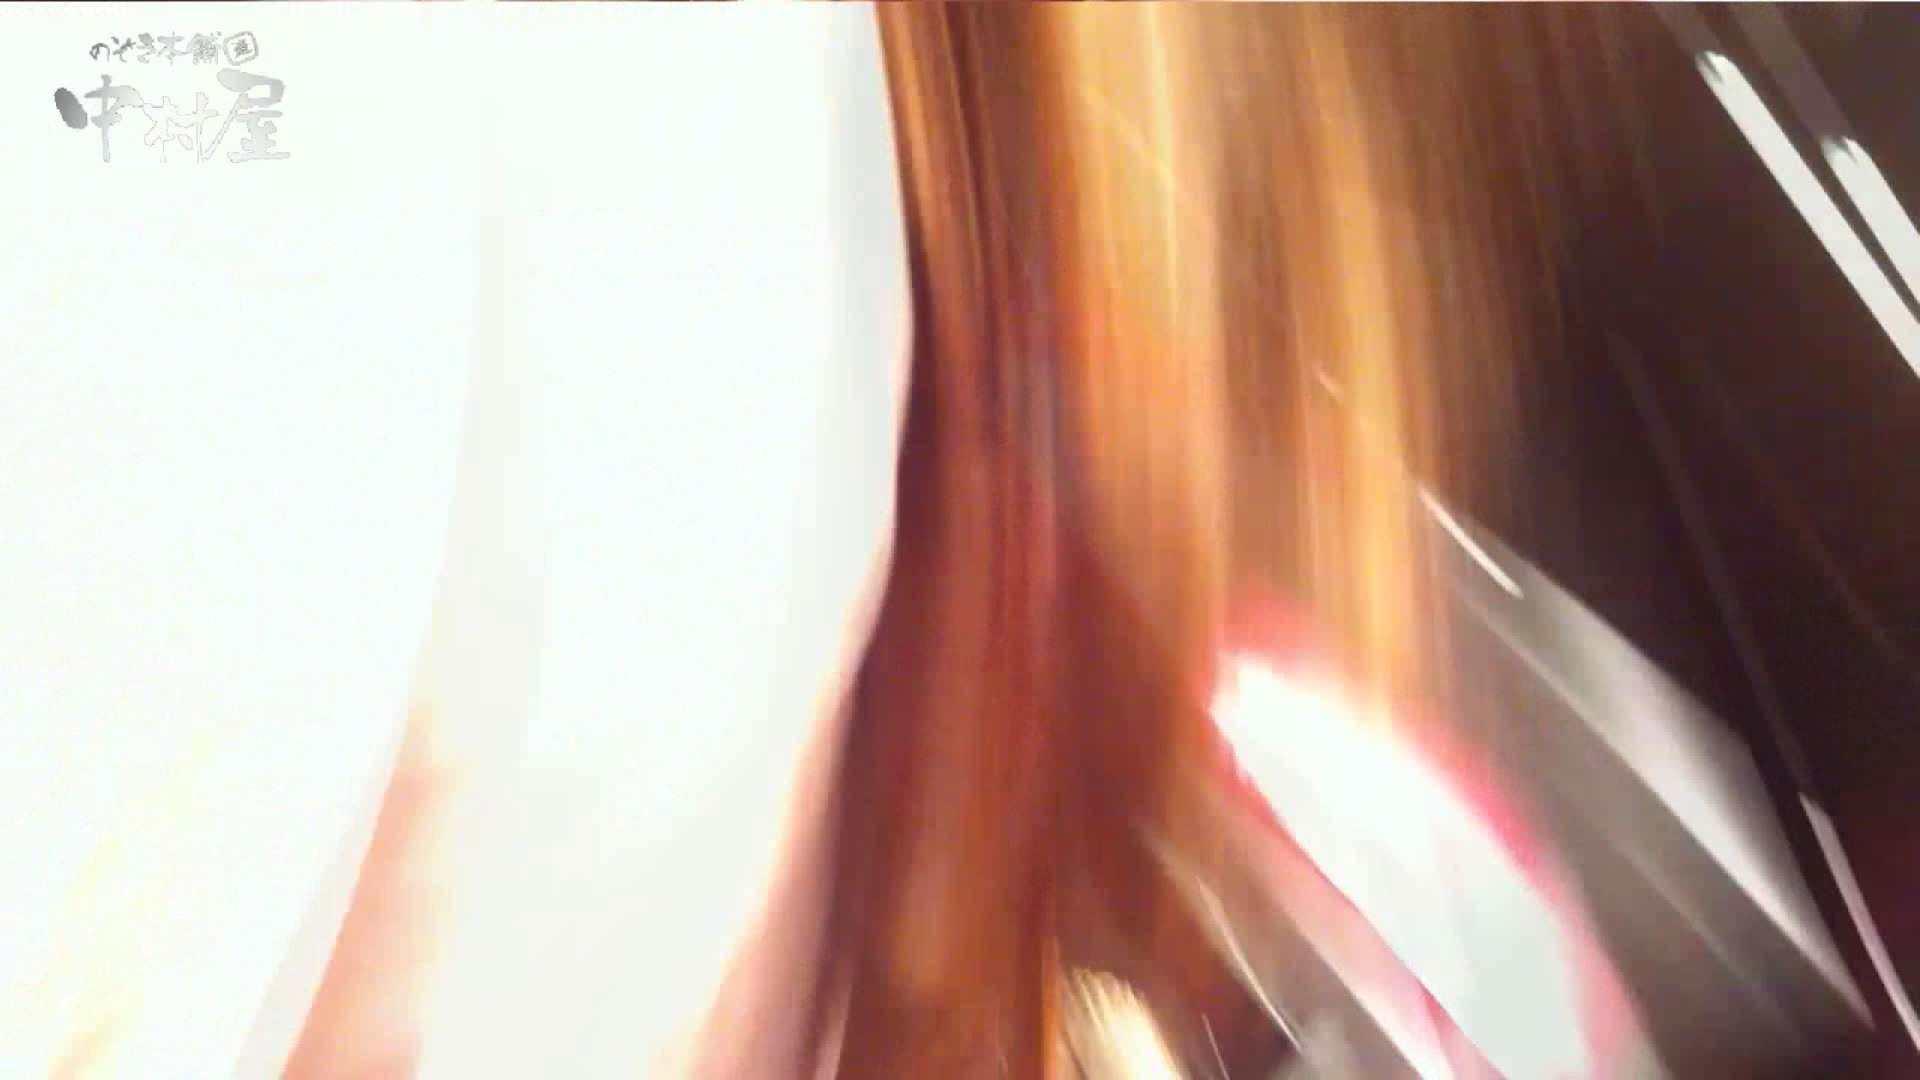 vol.70 美人アパレル胸チラ&パンチラ ベレー店員さんの下着 接写 のぞき濡れ場動画紹介 90PICs 17